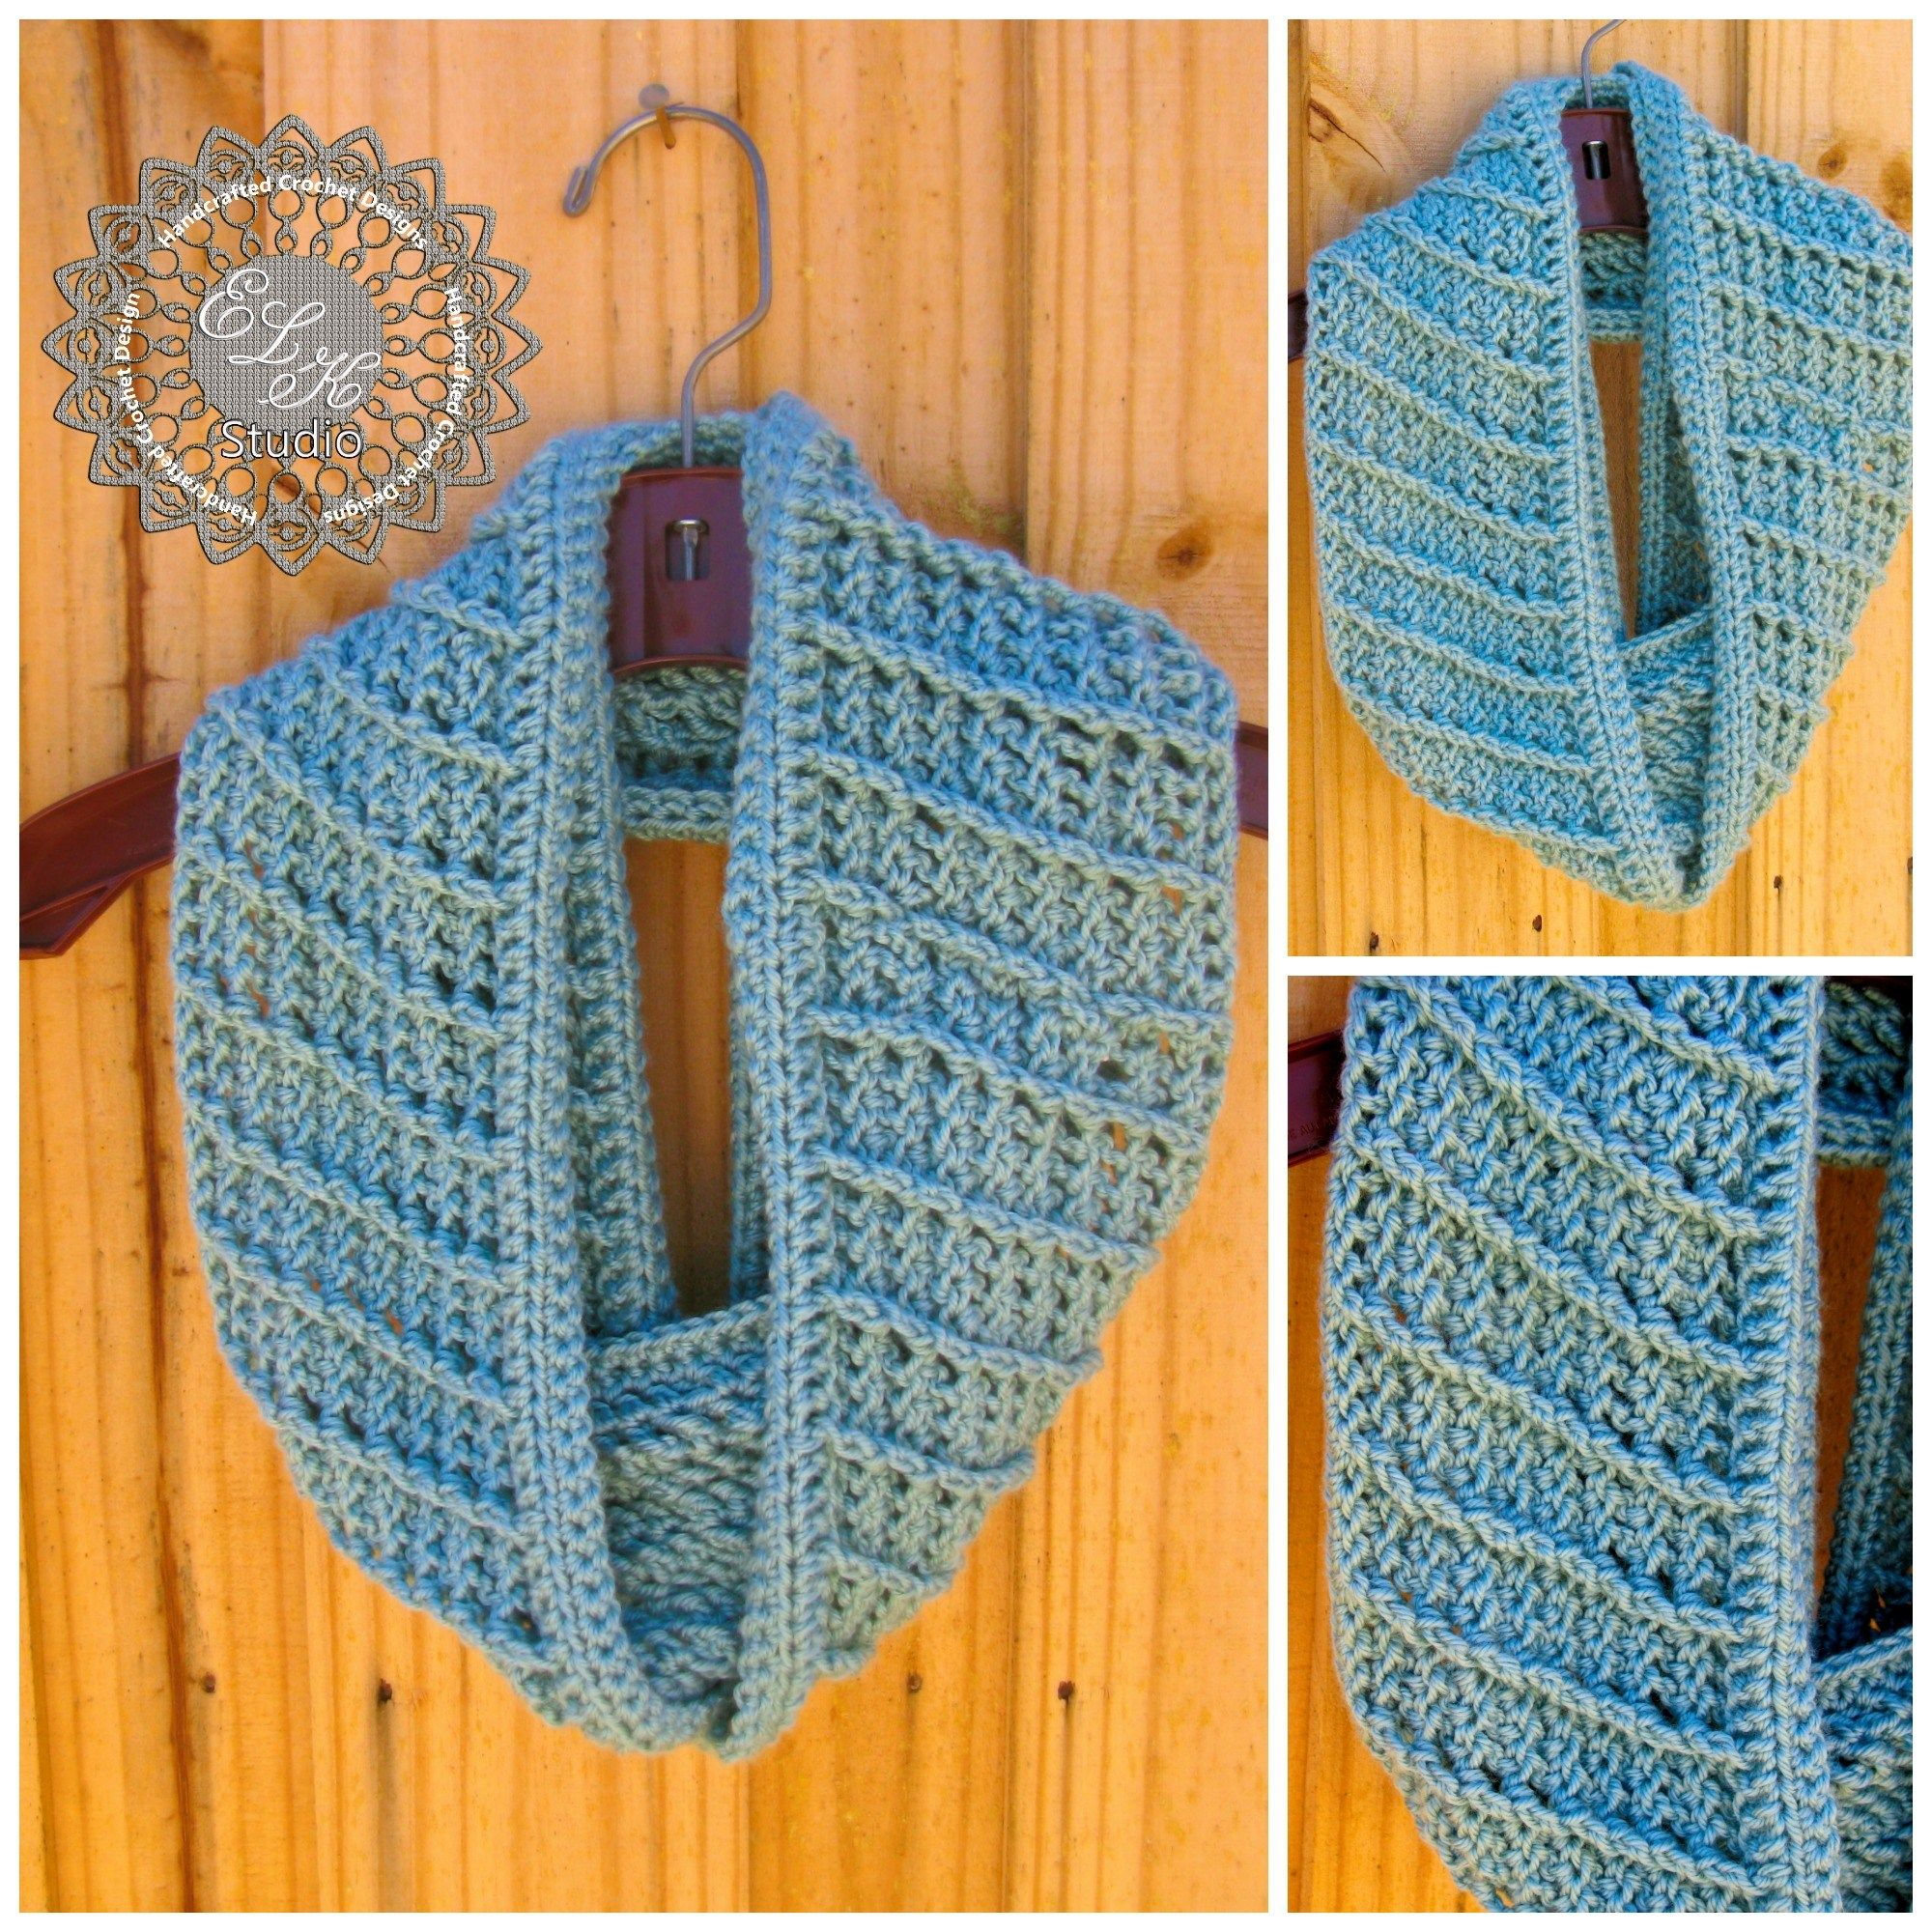 Country Appeal - A Free Crochet Infinity Scarf Pattern | Tejido